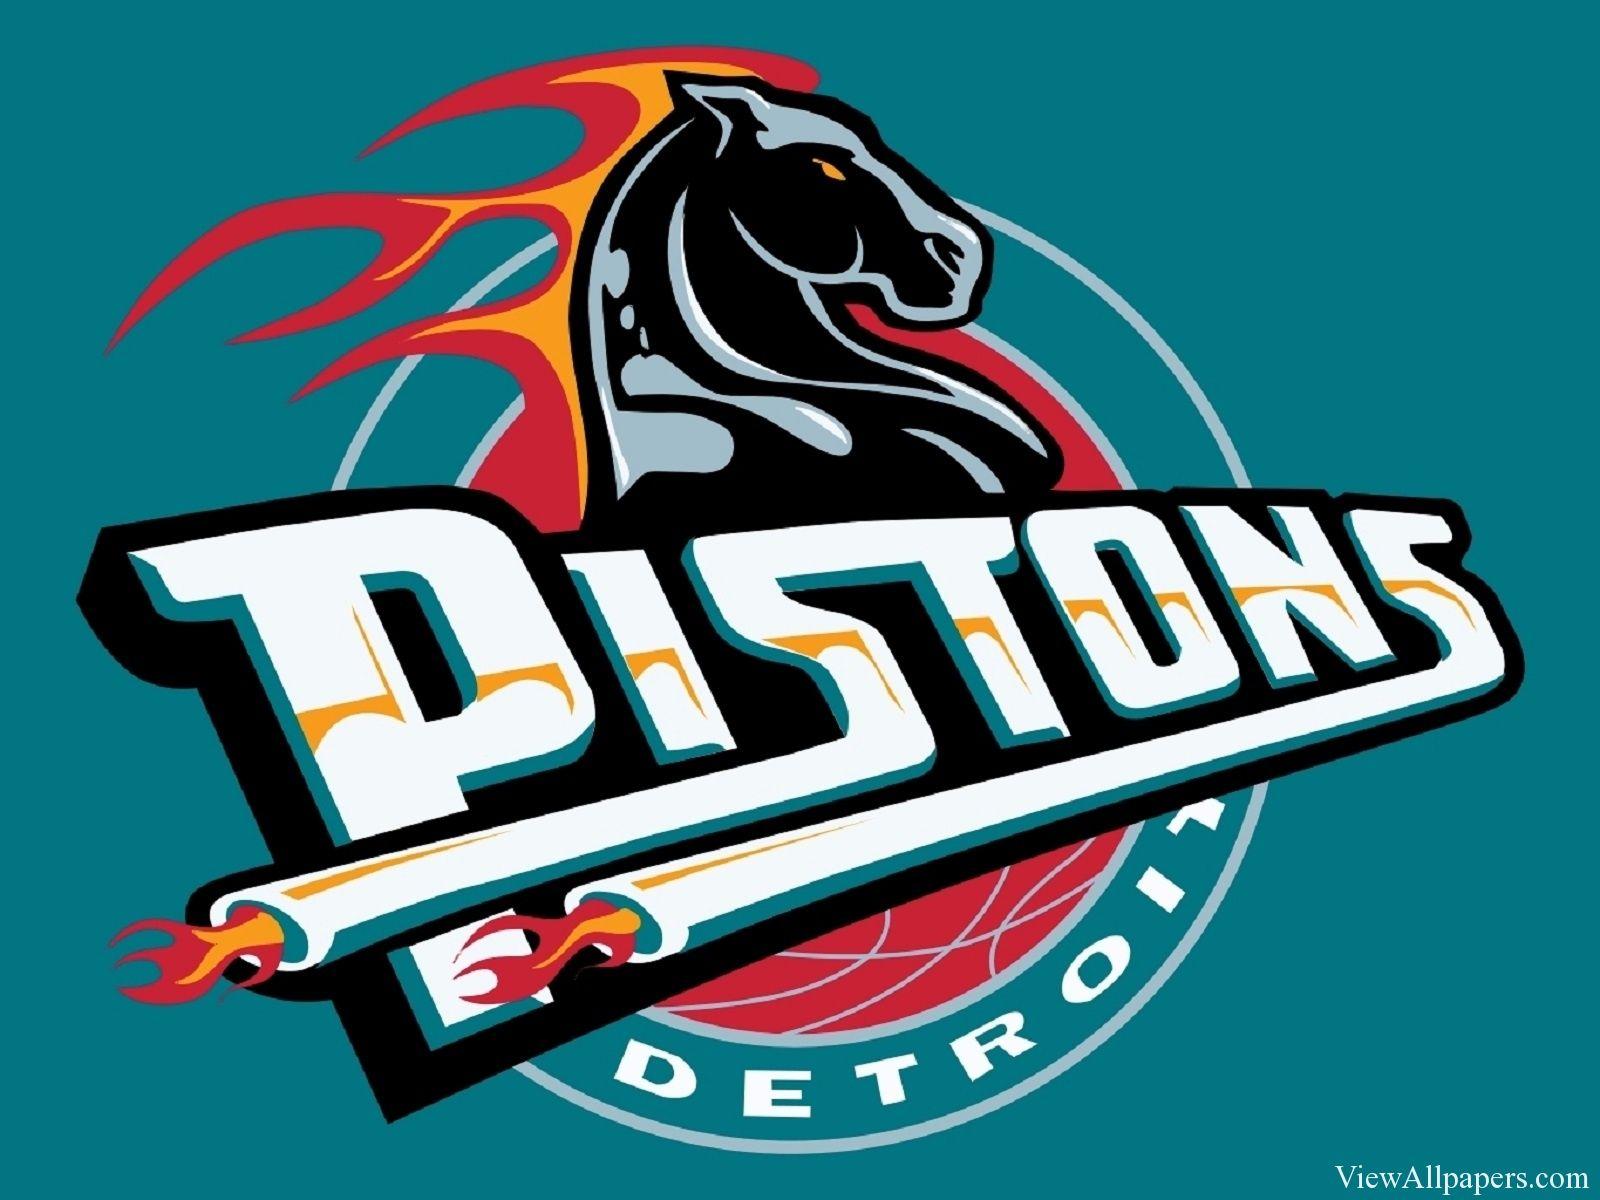 Detroit Pistons Logo Pistons logo, Detroit pistons, Pistons